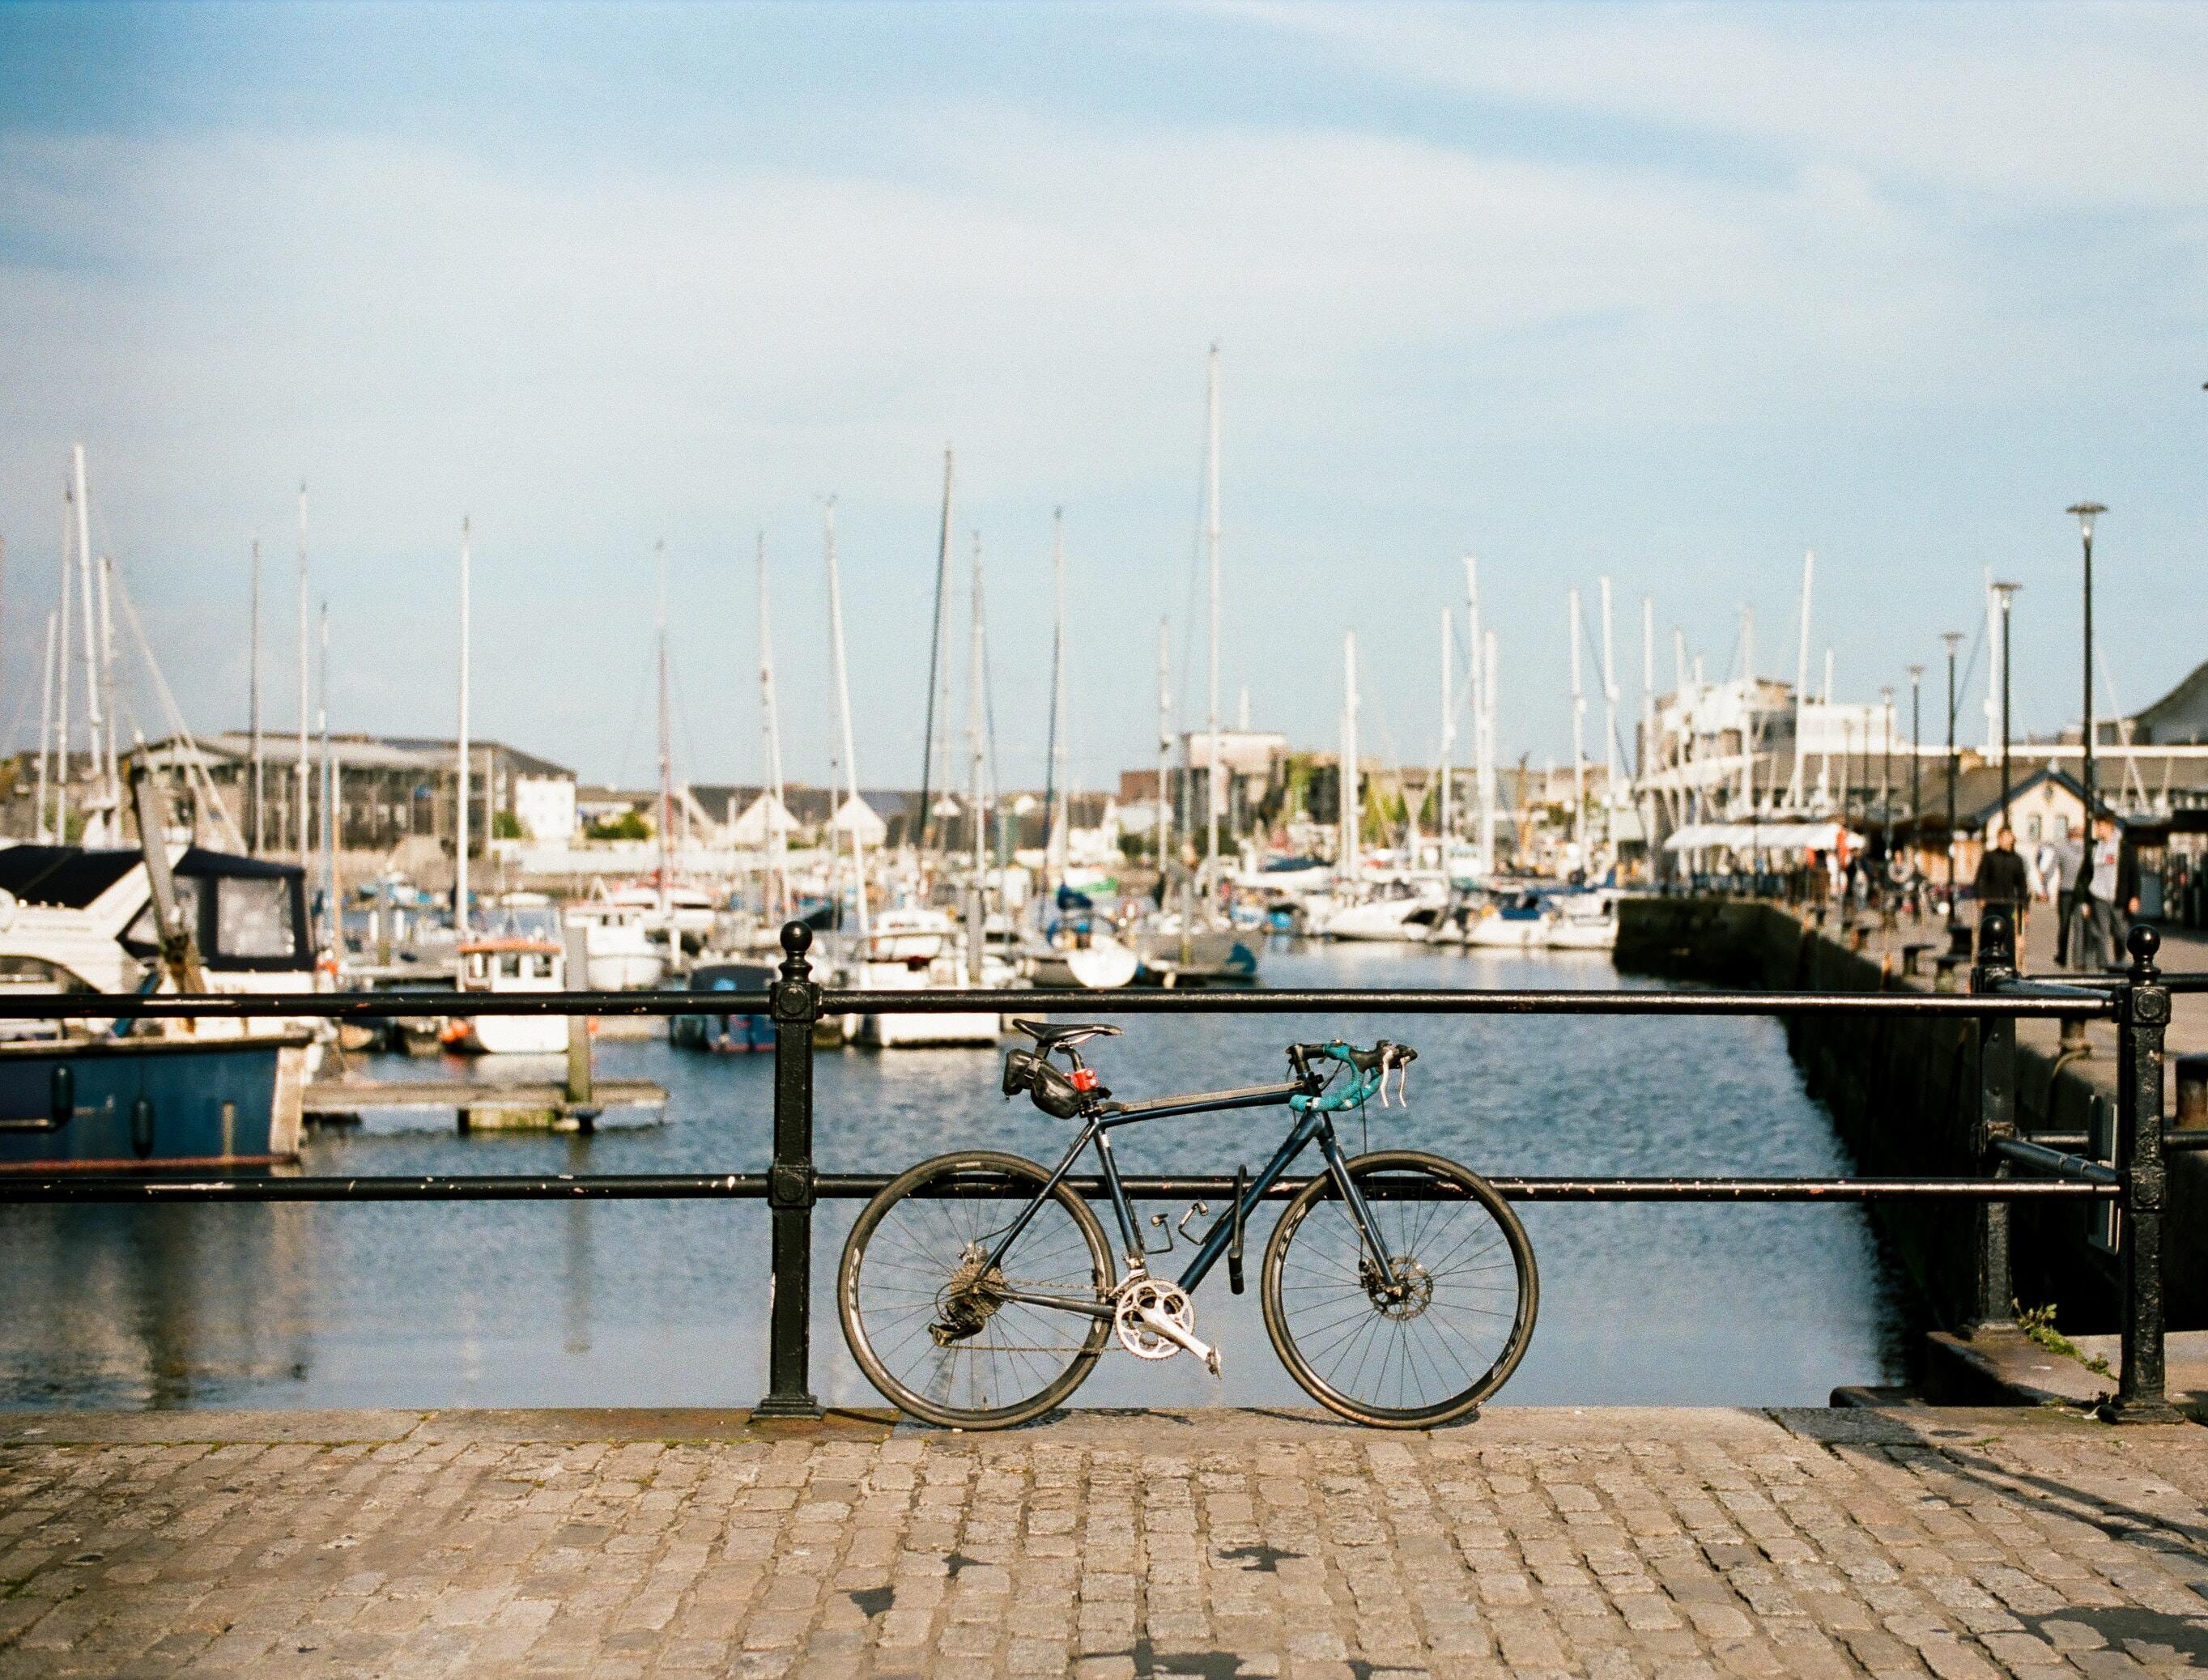 black bike parked near black railings